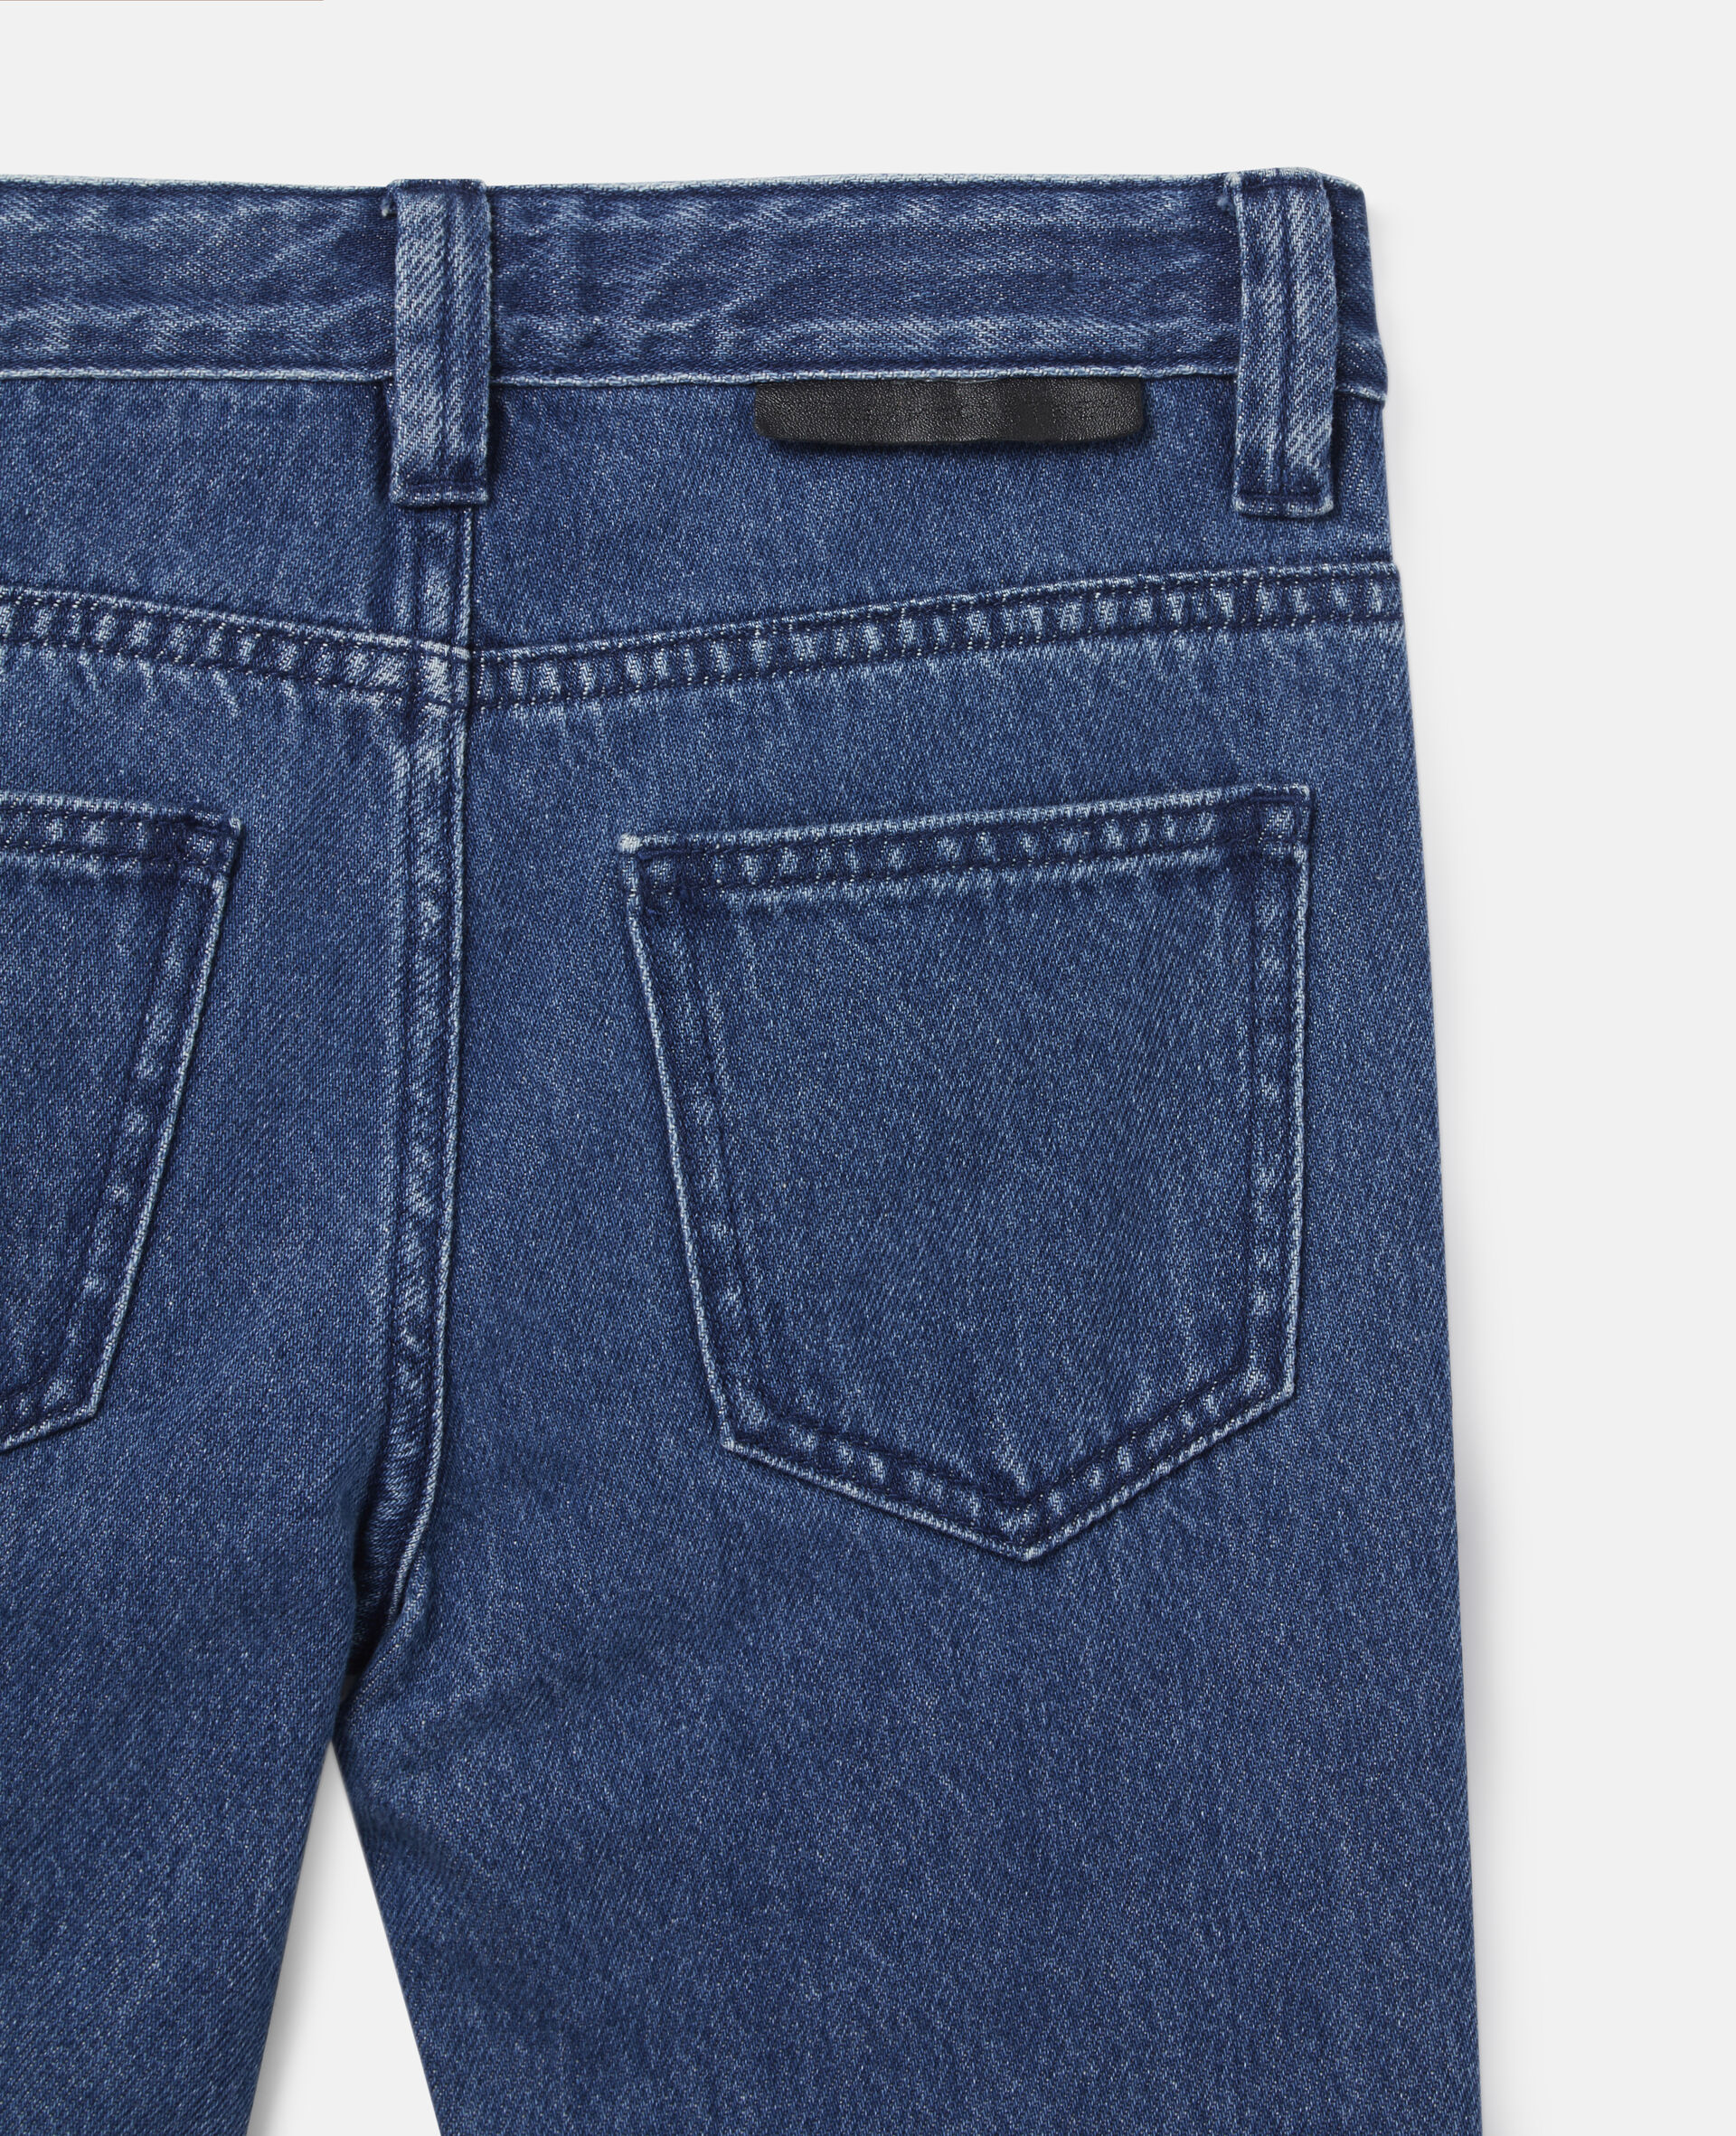 Pantalon en denim-Bleu-large image number 1